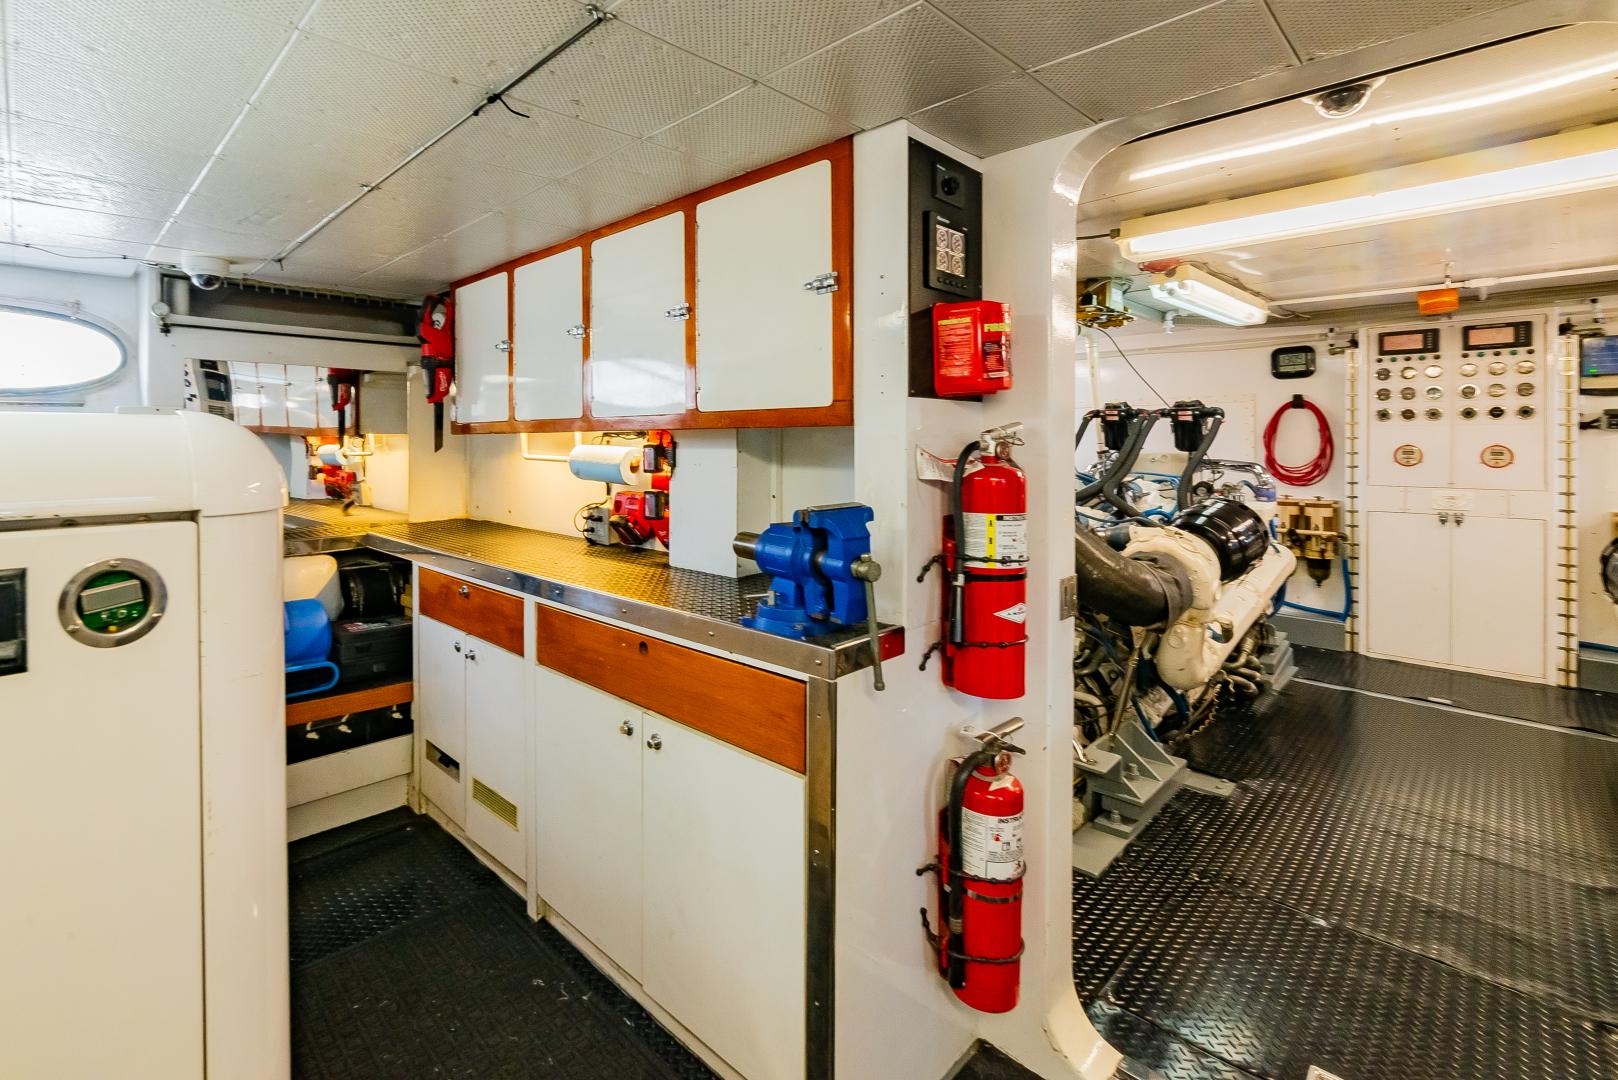 Barattucci-Yachtfisher 1992-STEADFAST Seattle-Washington-United States-GENERATOR ROOM-1284185 | Thumbnail